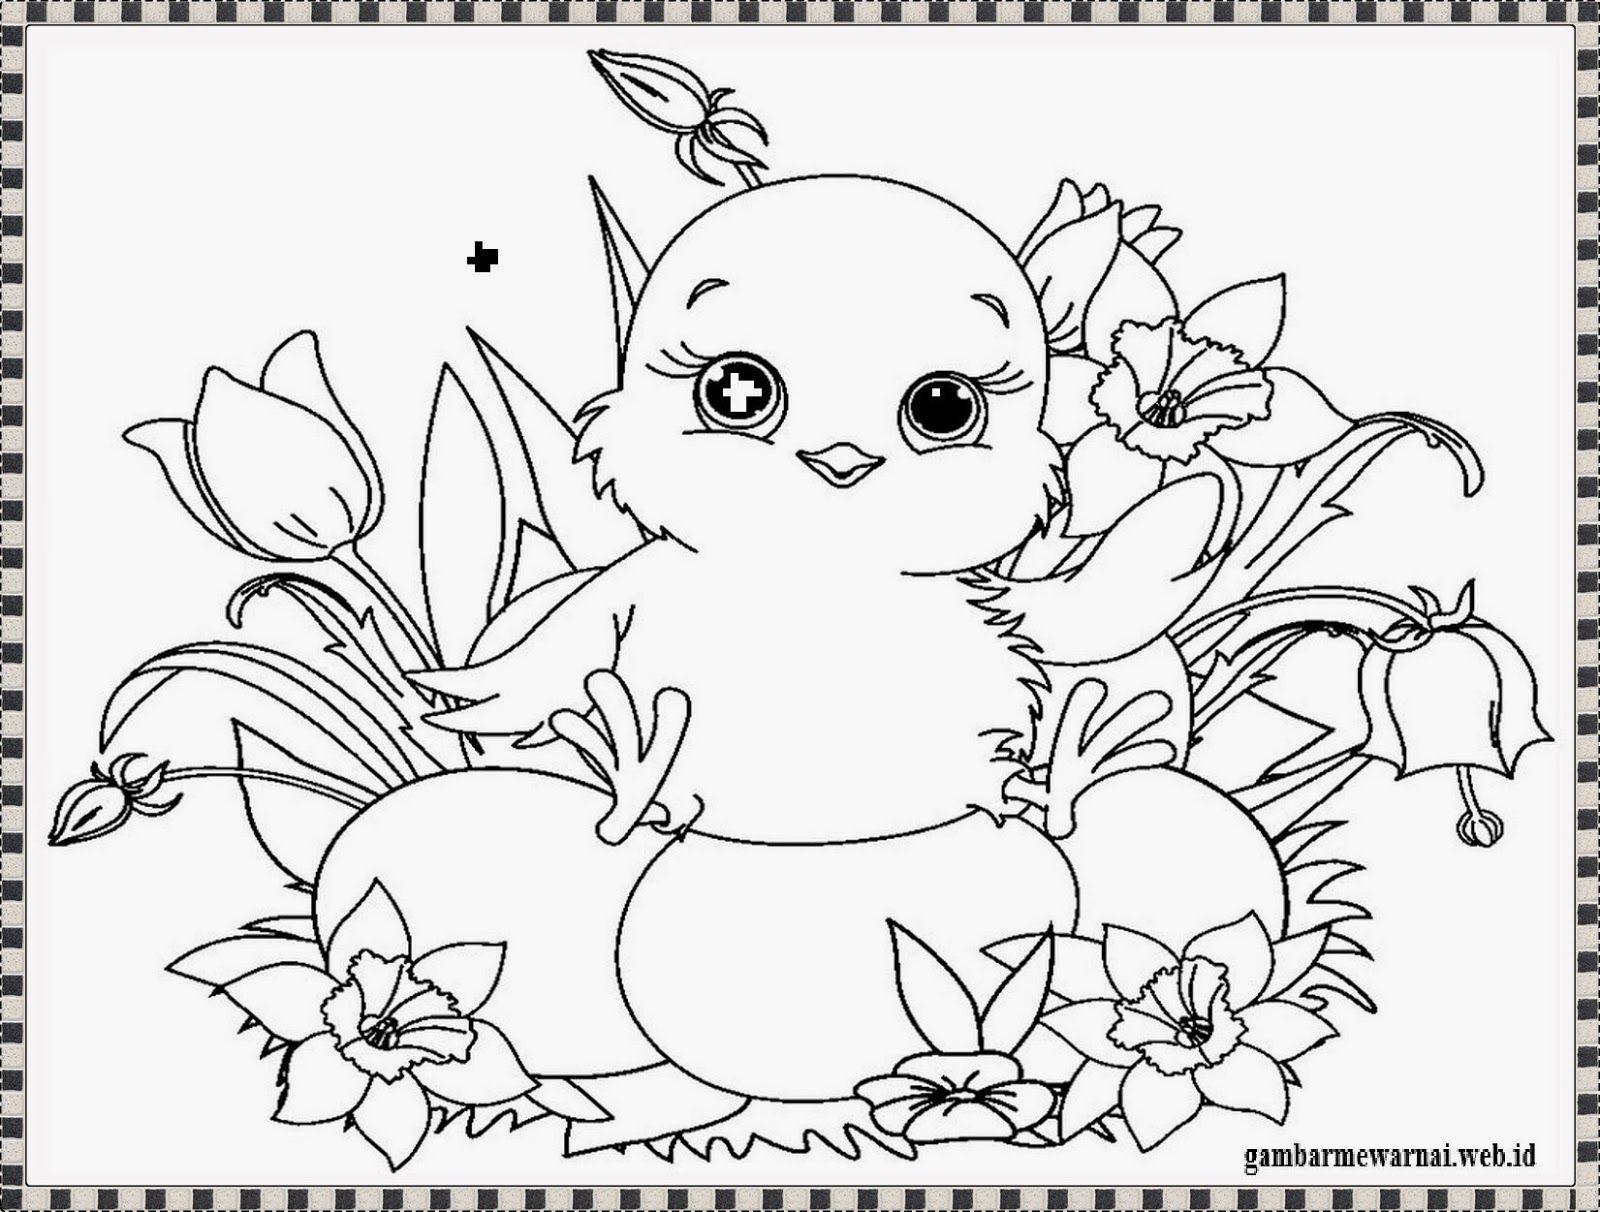 Gambar Mewarnai Anak Ayam Gambar Mewarnai Pinterest